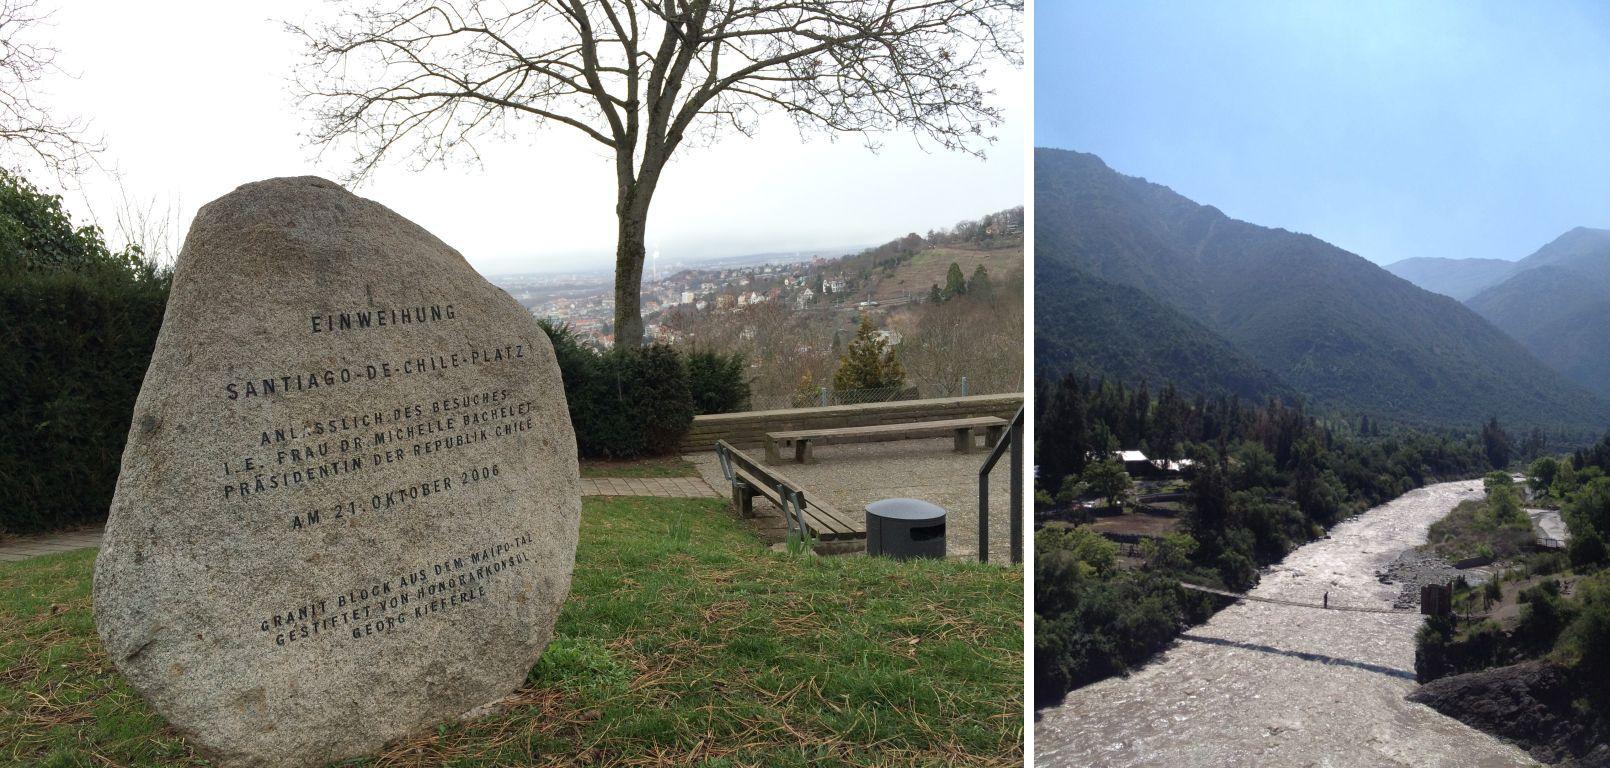 Granitblock Santiago-de-Chile-Platz und Maipo-Tal